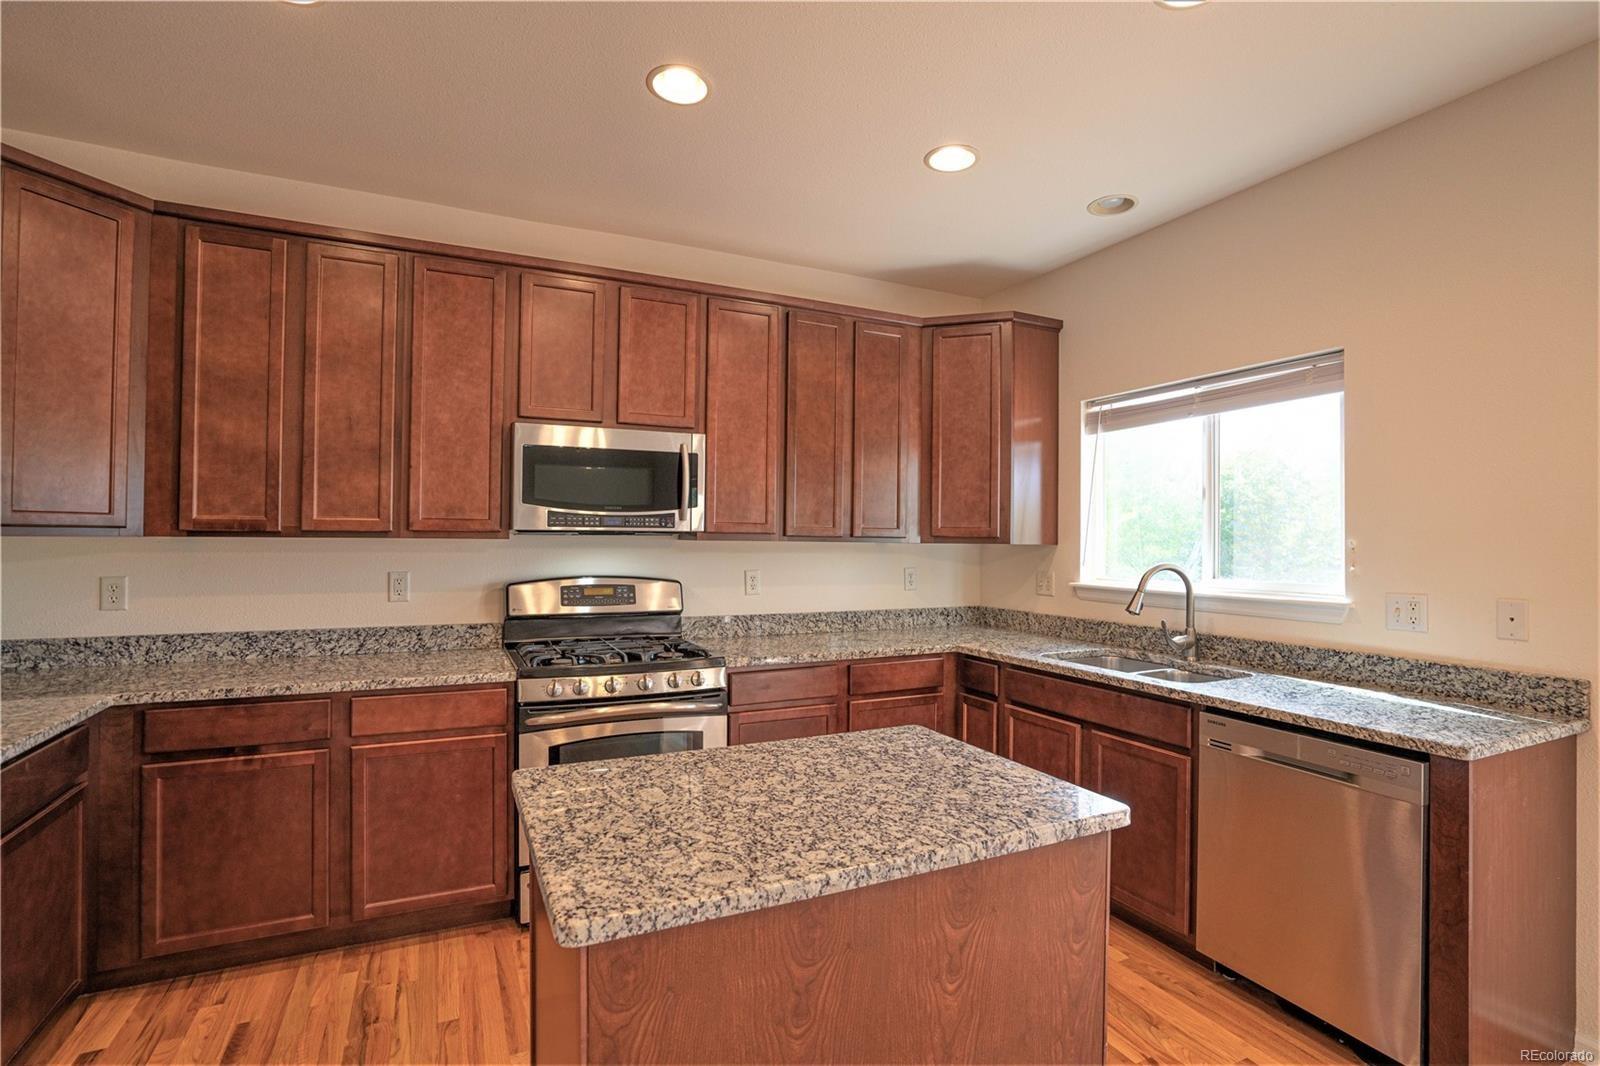 MLS# 7654141 - 6 - 961 Sparrow Hawk Drive, Longmont, CO 80504